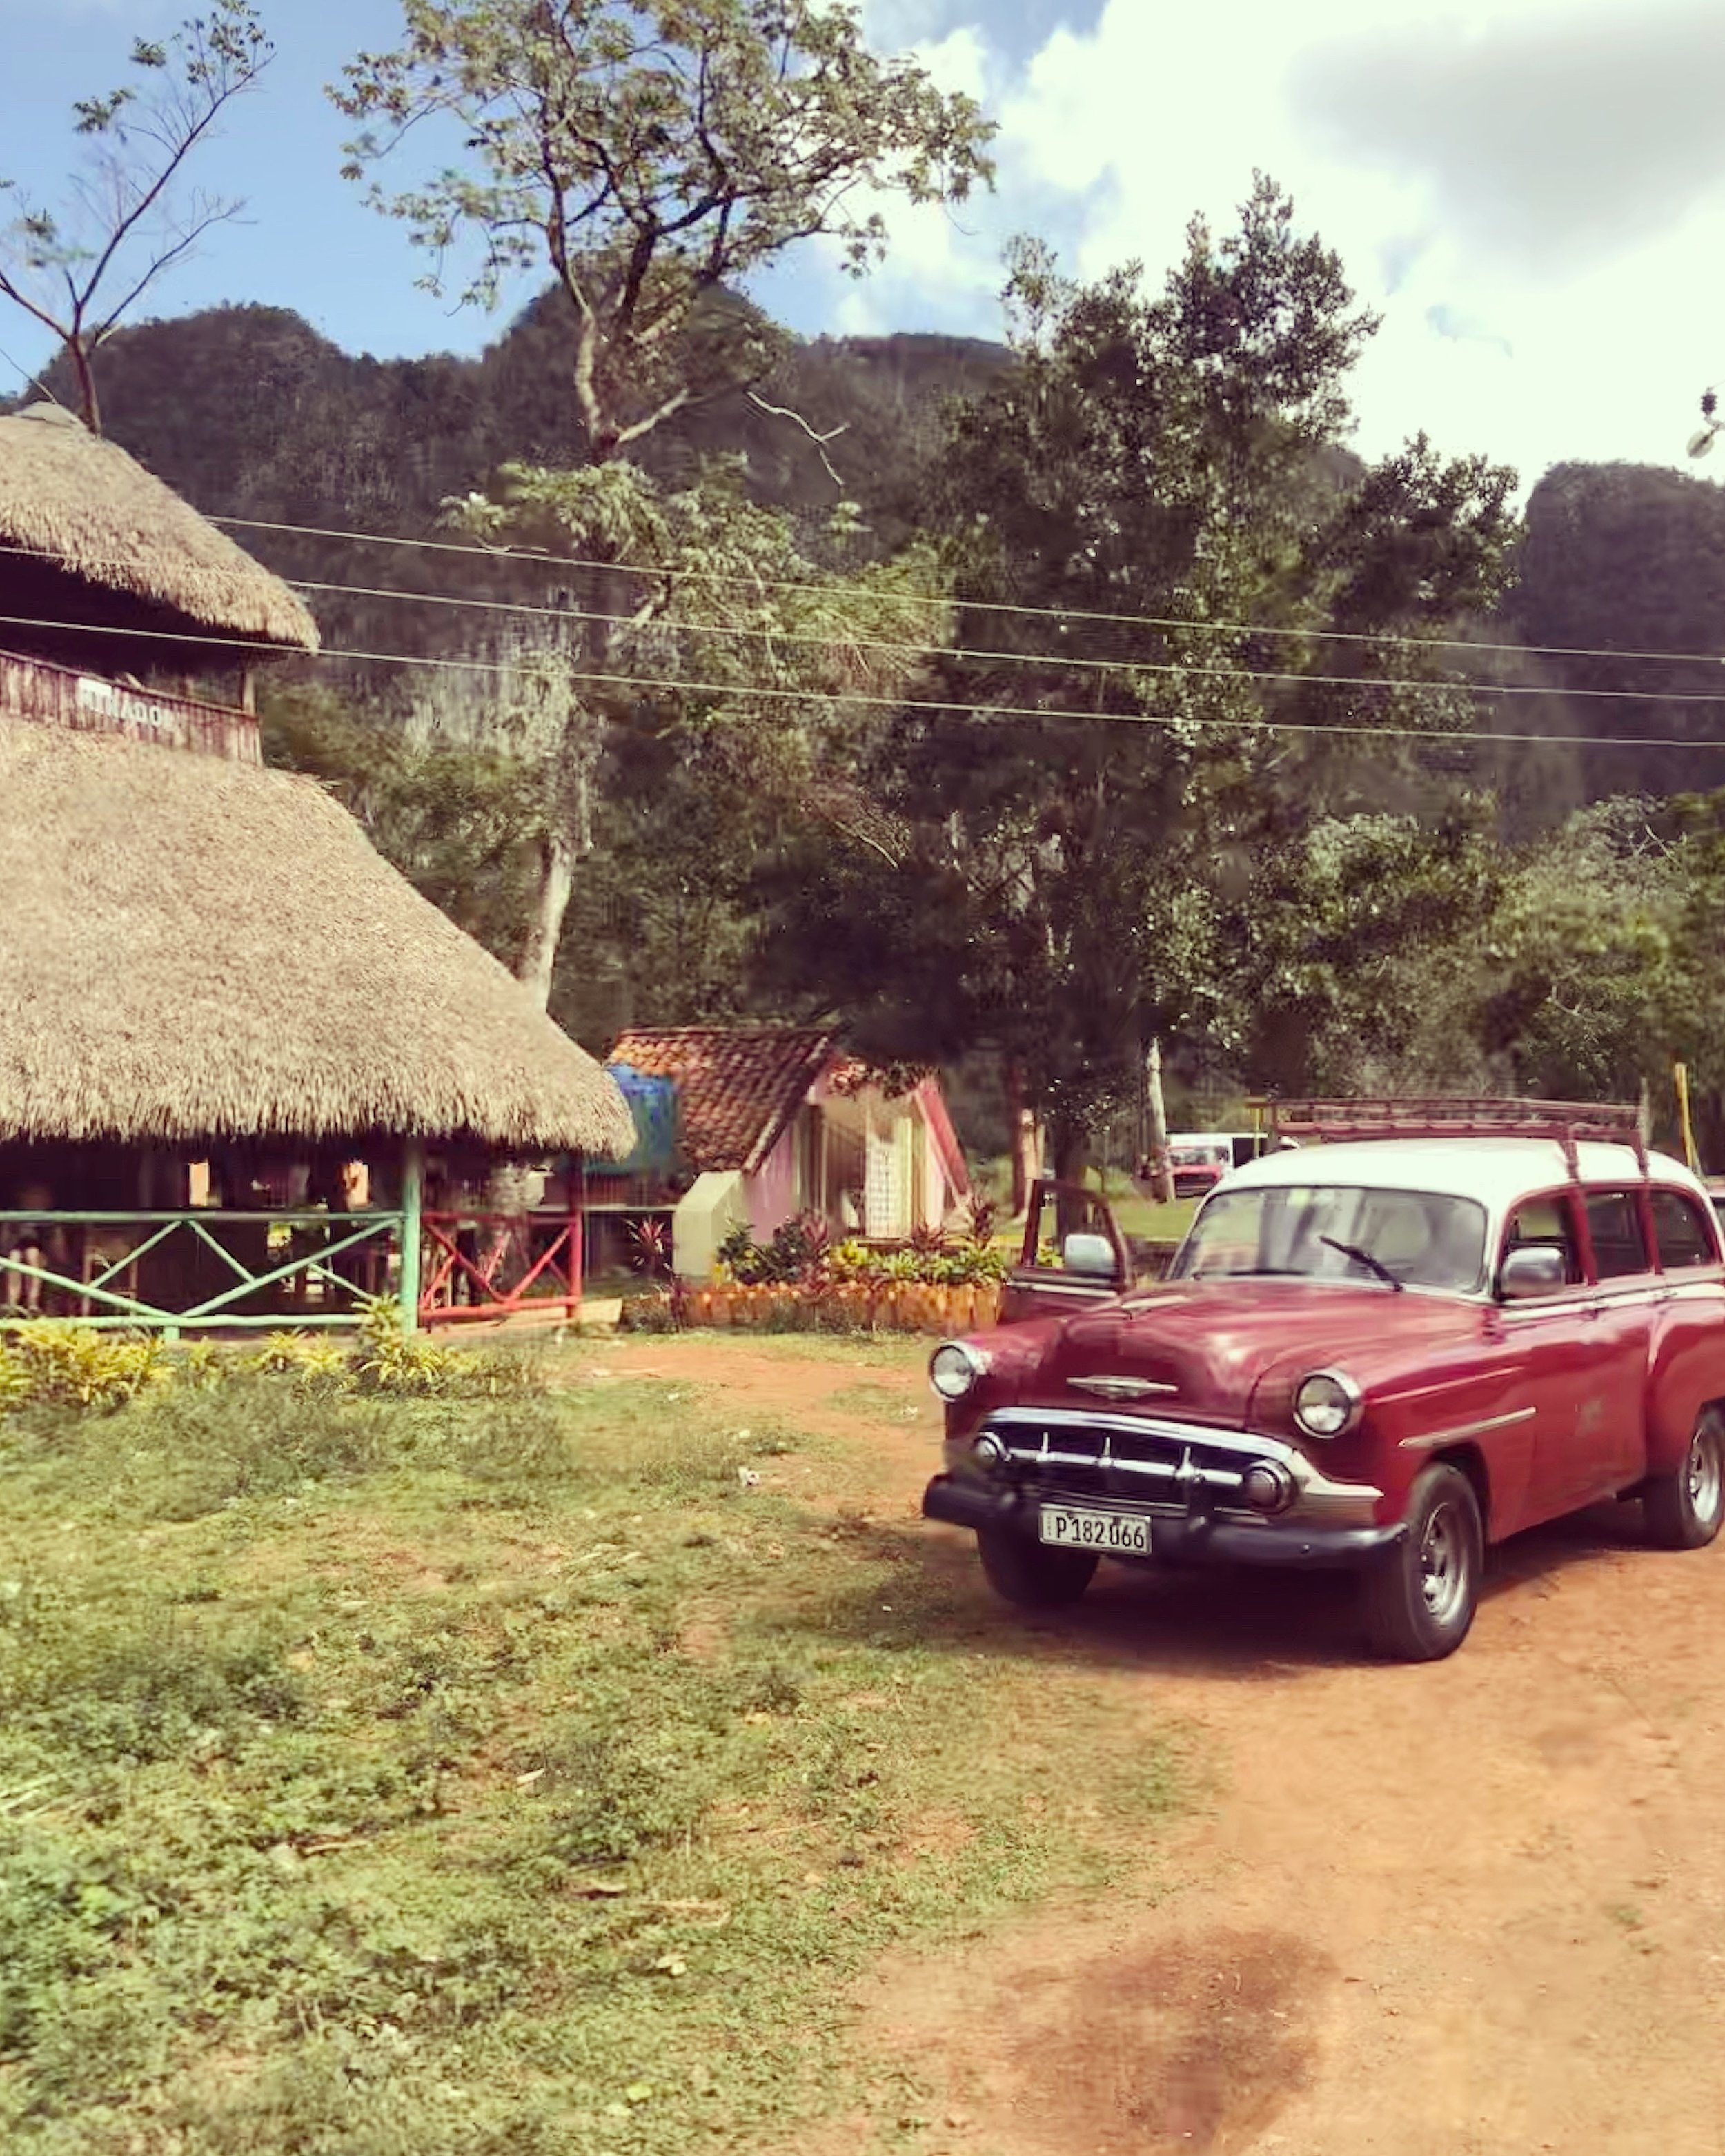 Family trip to Cuba